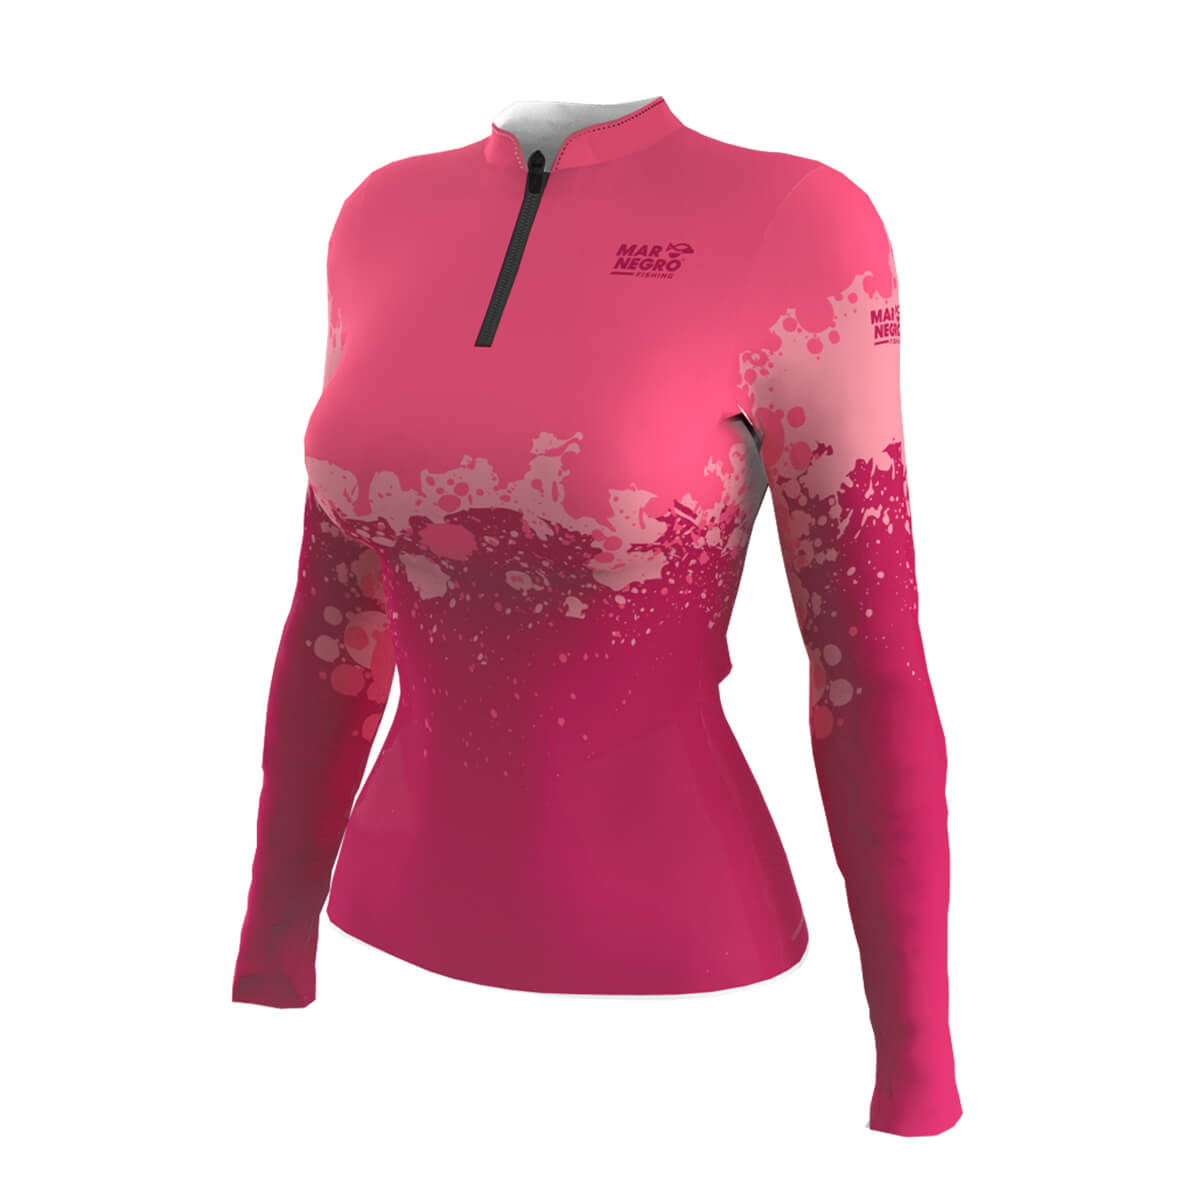 Camiseta Mar Negro Feminina 2021 Clean Rosa  - Pró Pesca Shop